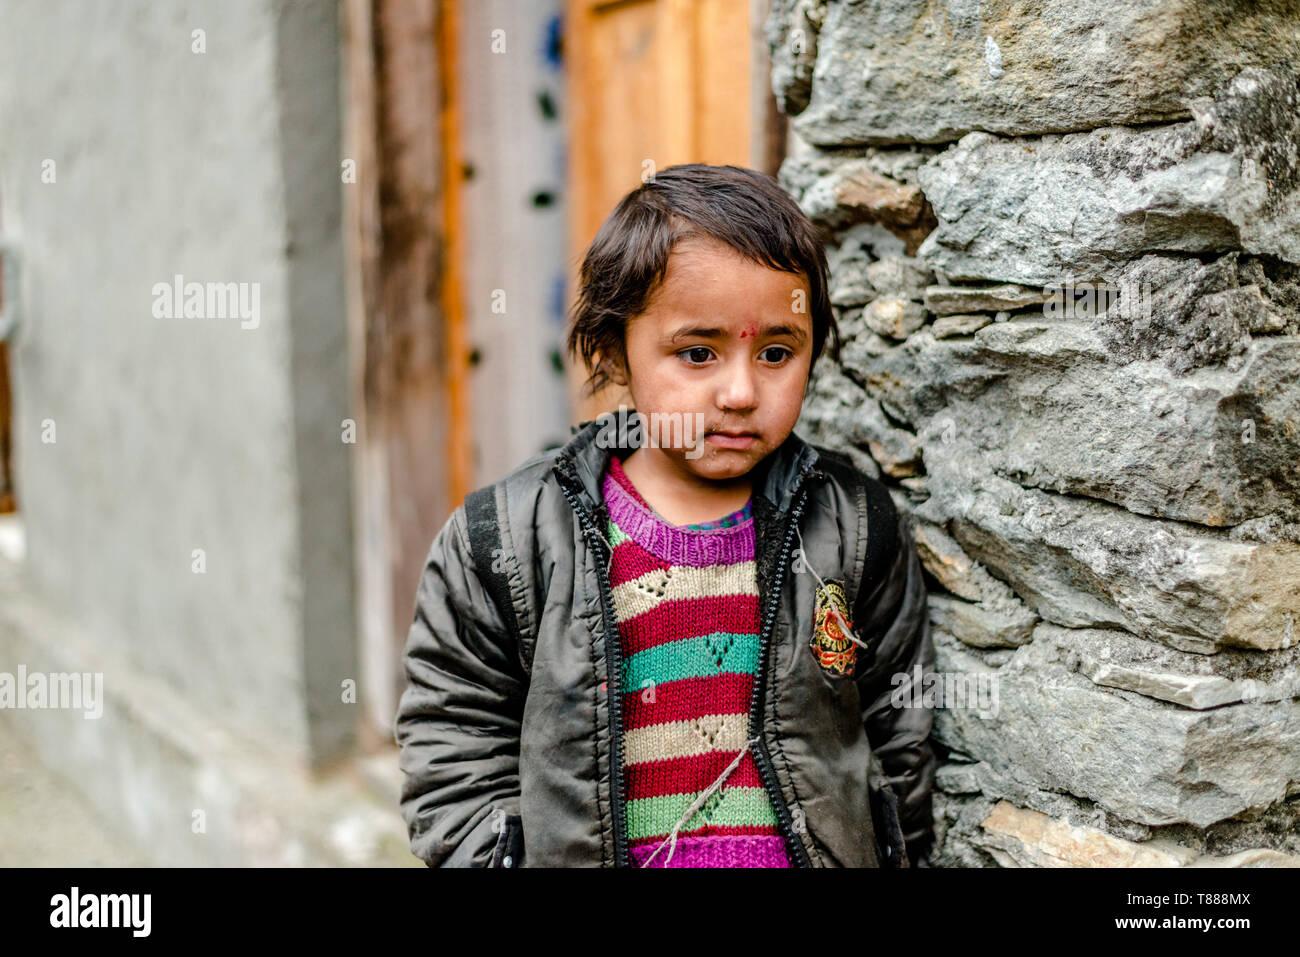 Kullu, Himachal Pradesh, India - April 01, 2019 : Portrait himachali girl near her house on the street in Himalayan village - India - Stock Image